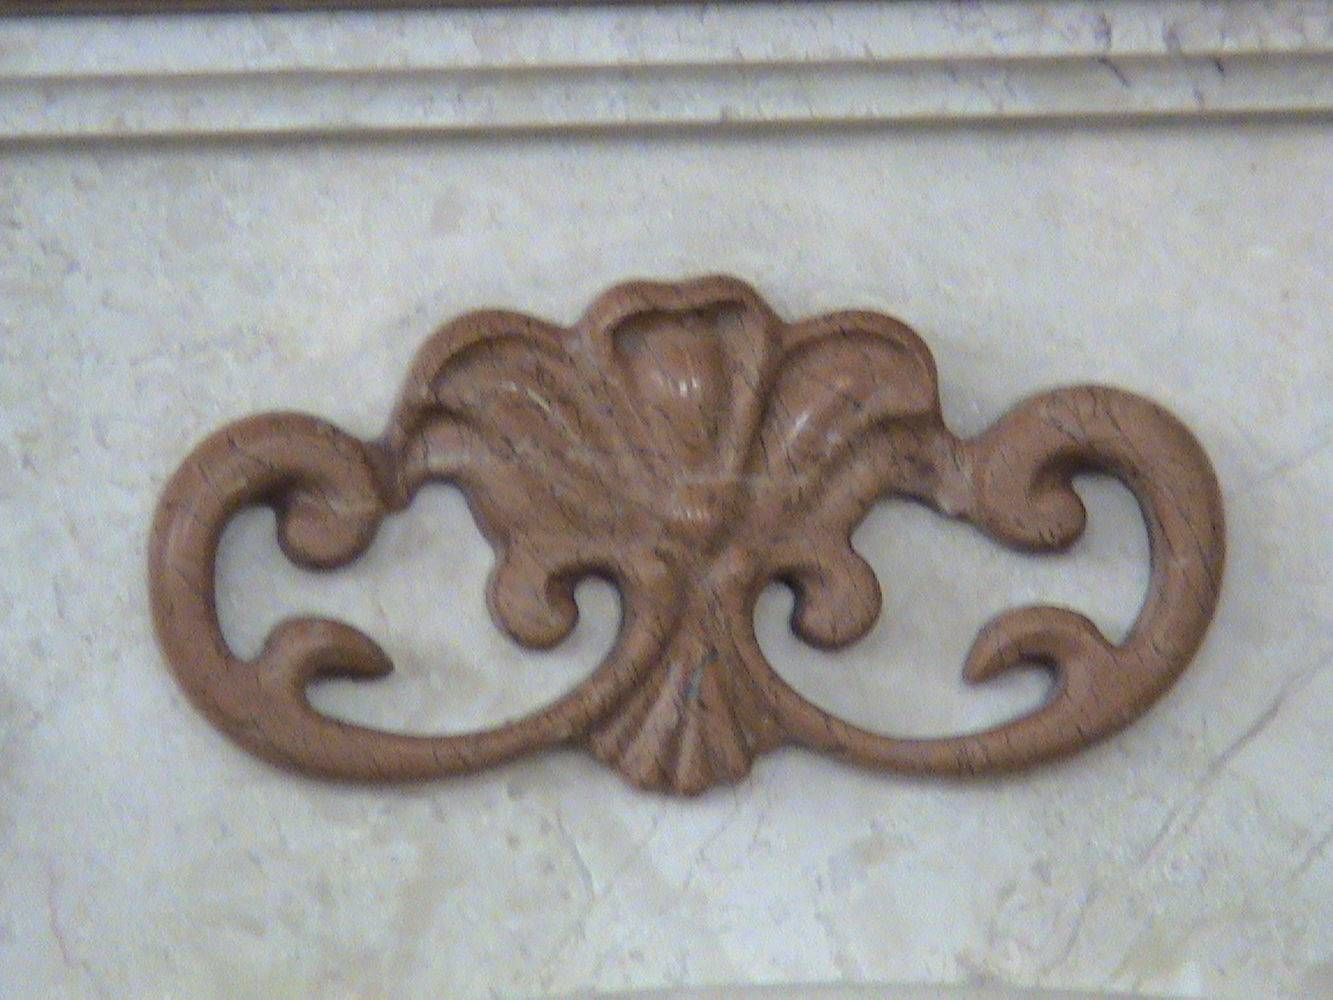 Украшение из мрамора на камин фото 1 — изелия и проекты от Bevers Marmyr